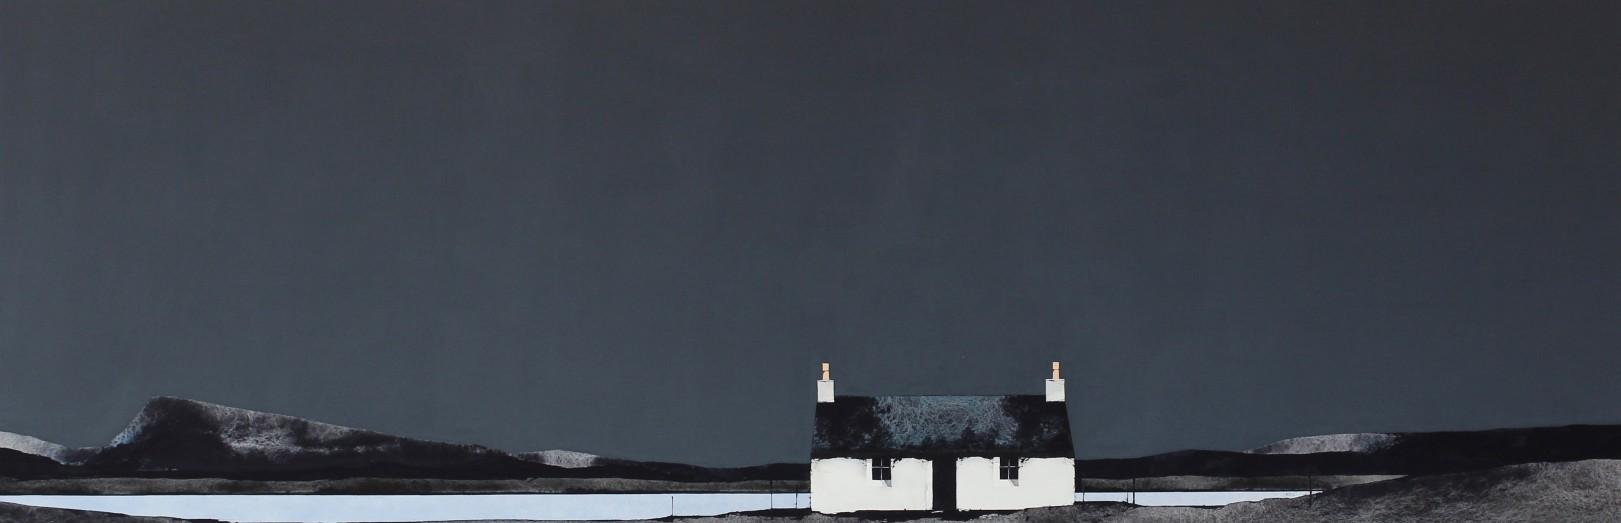 Ron Lawson_EAS204_Bagh Mor by Eaval, North Uist_13x38.5